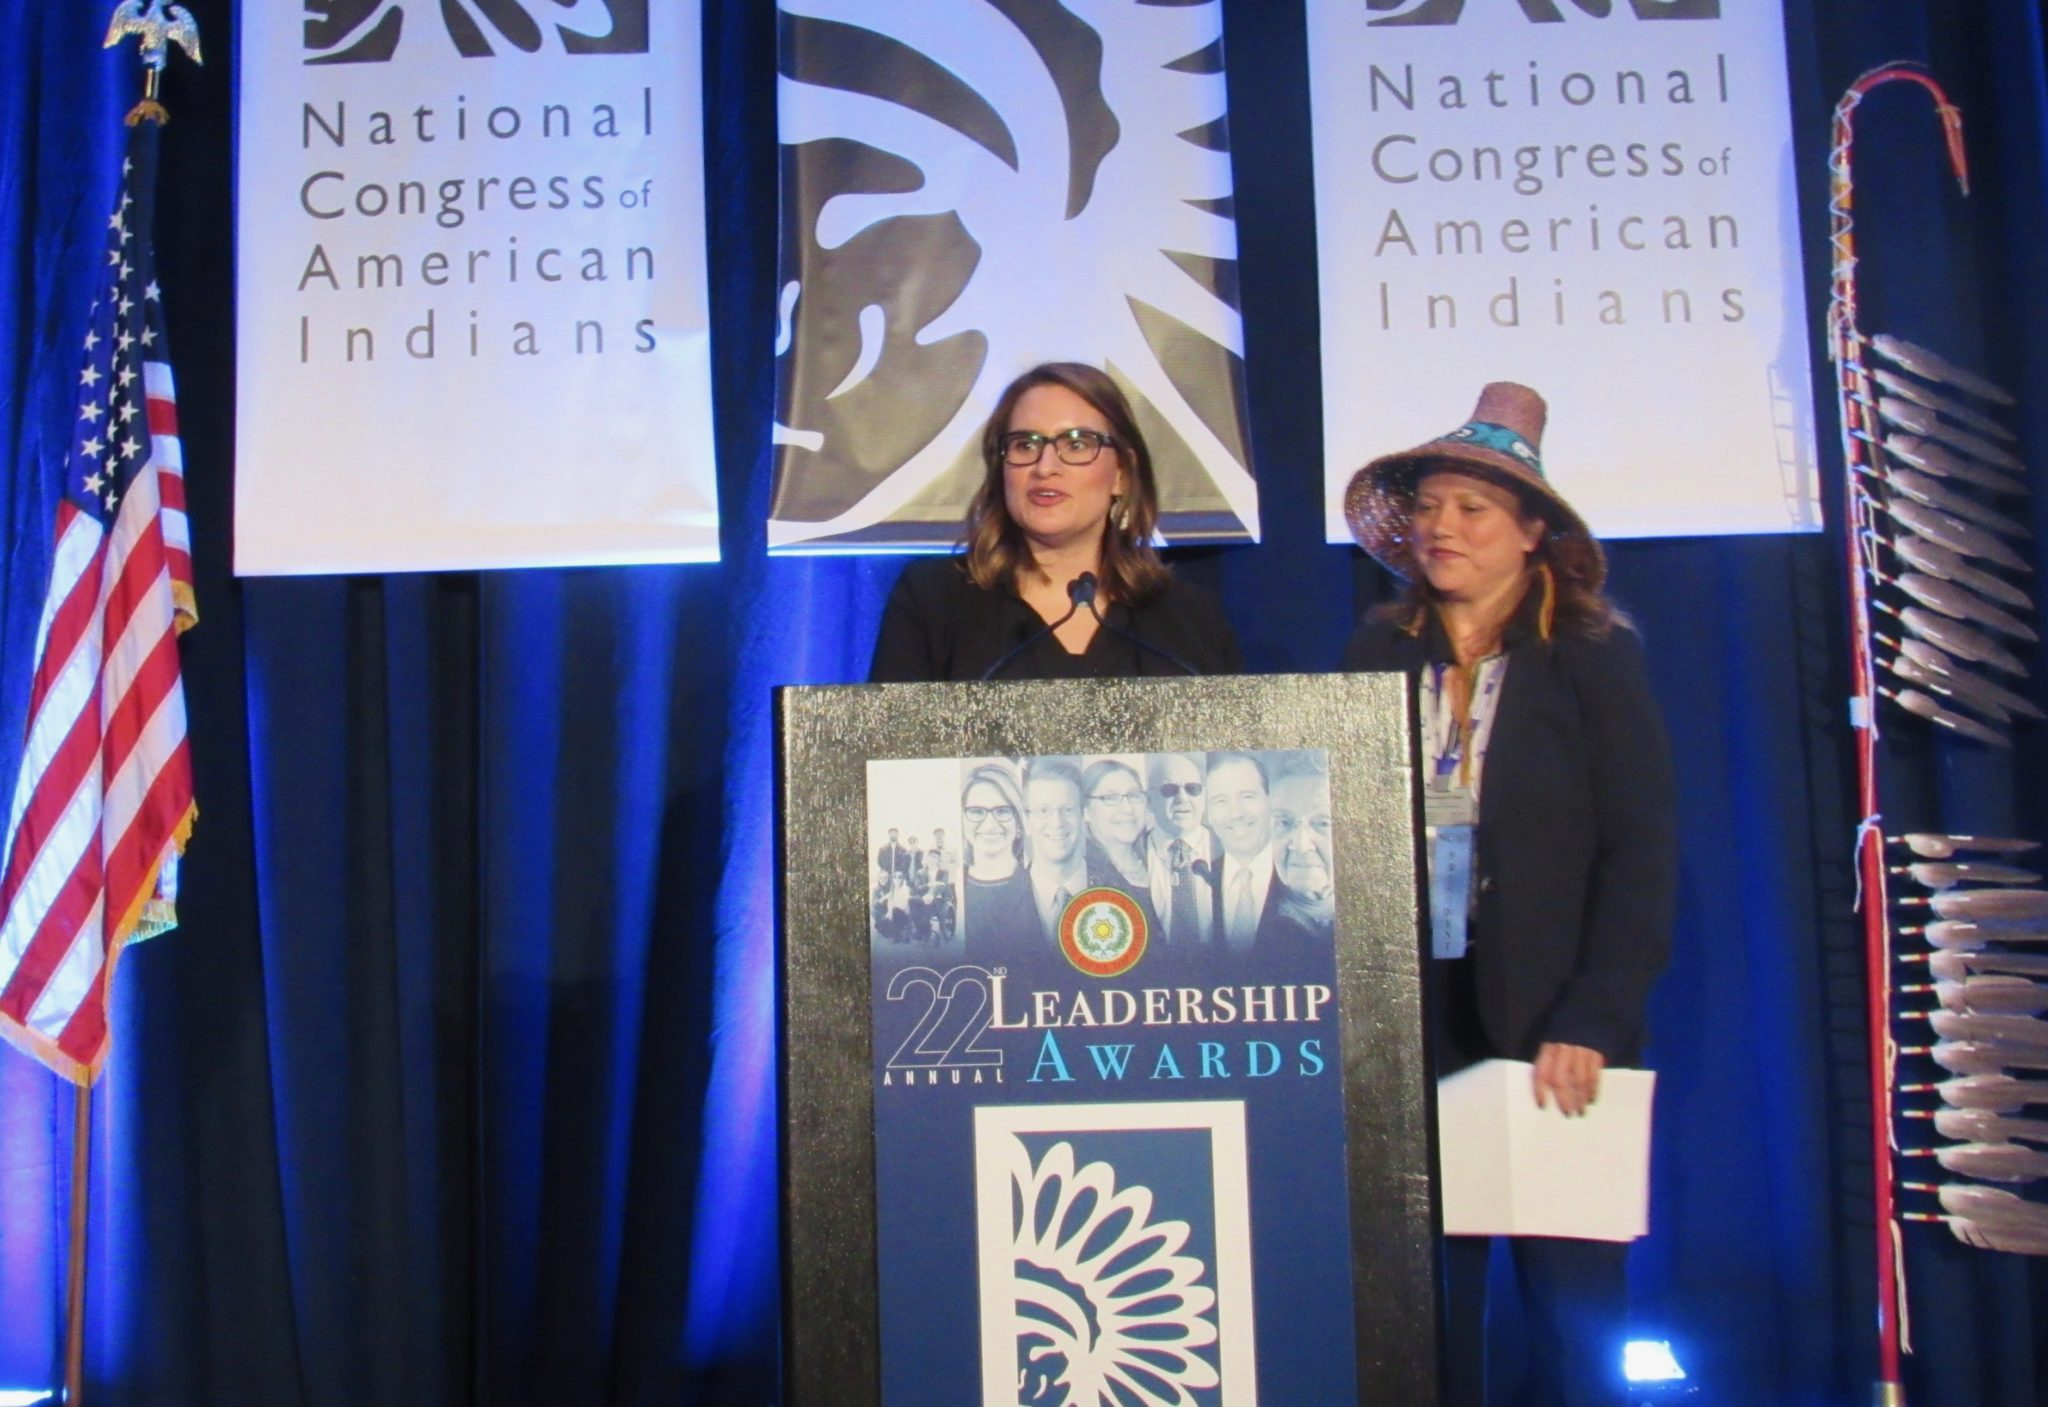 100-Year-Old Lakota Marcella Lebeau Among Recipients of NCAI Leadership Awards